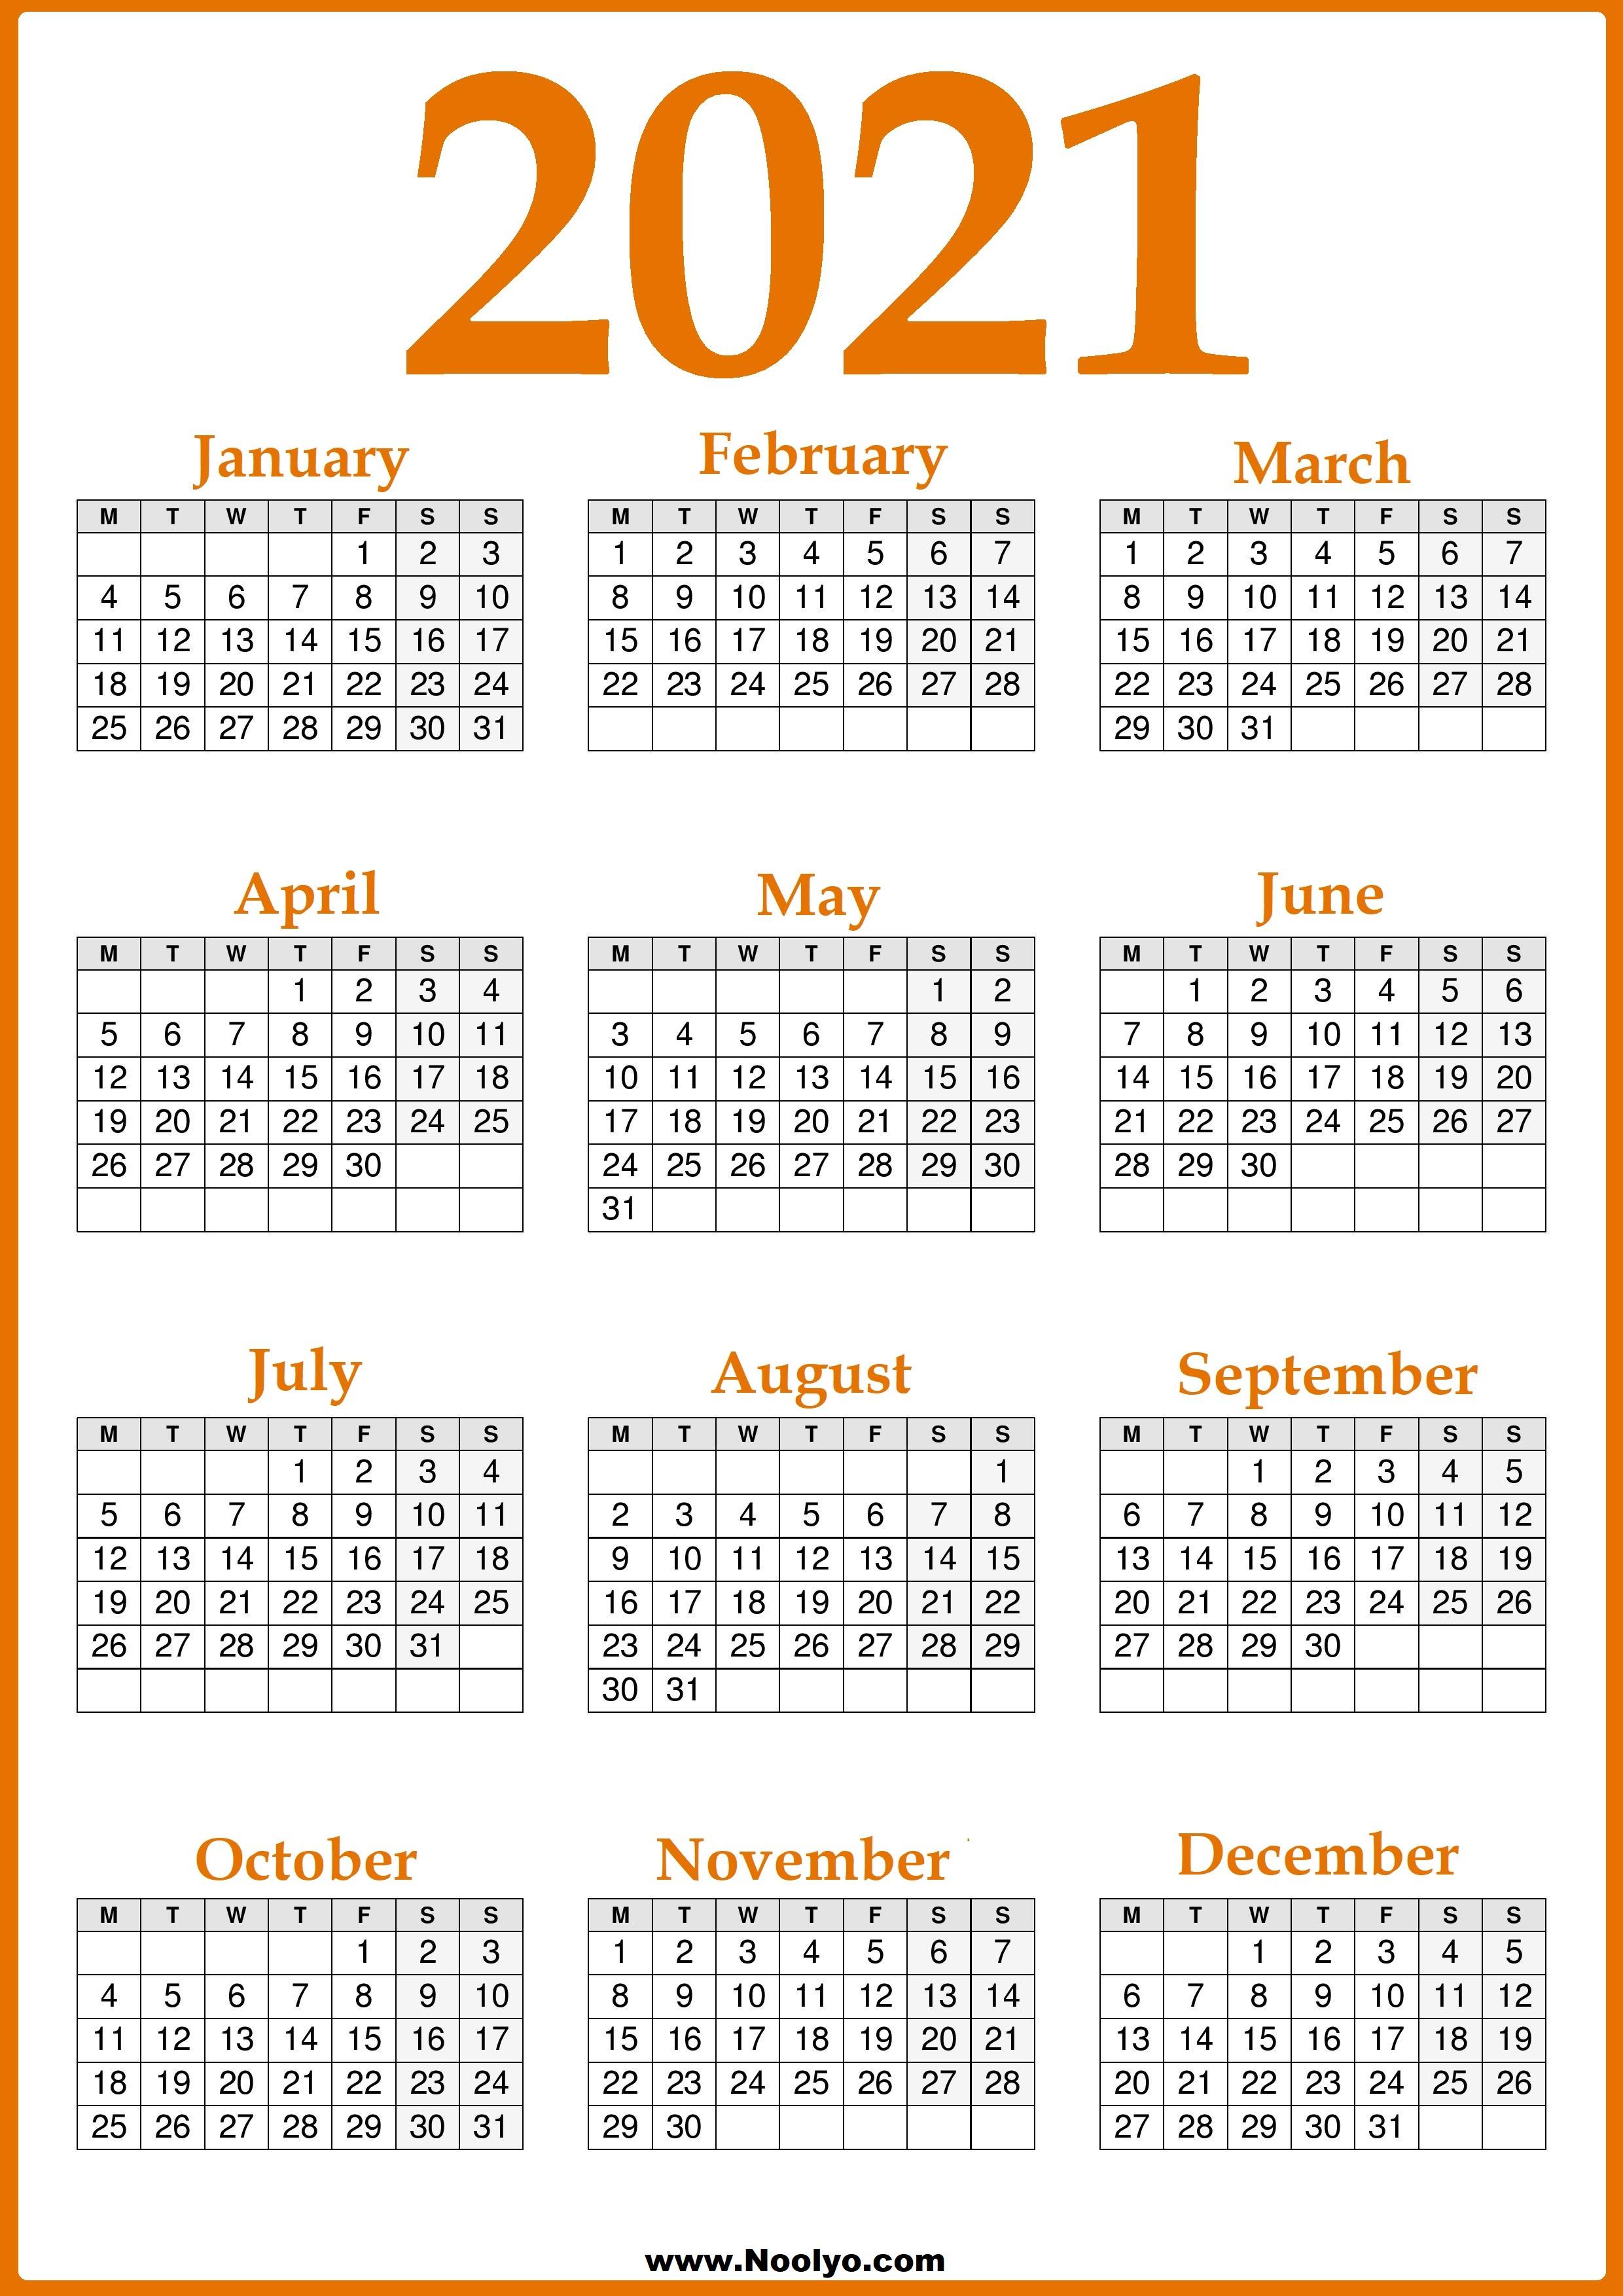 Free Printable 2021 Uk Calendar